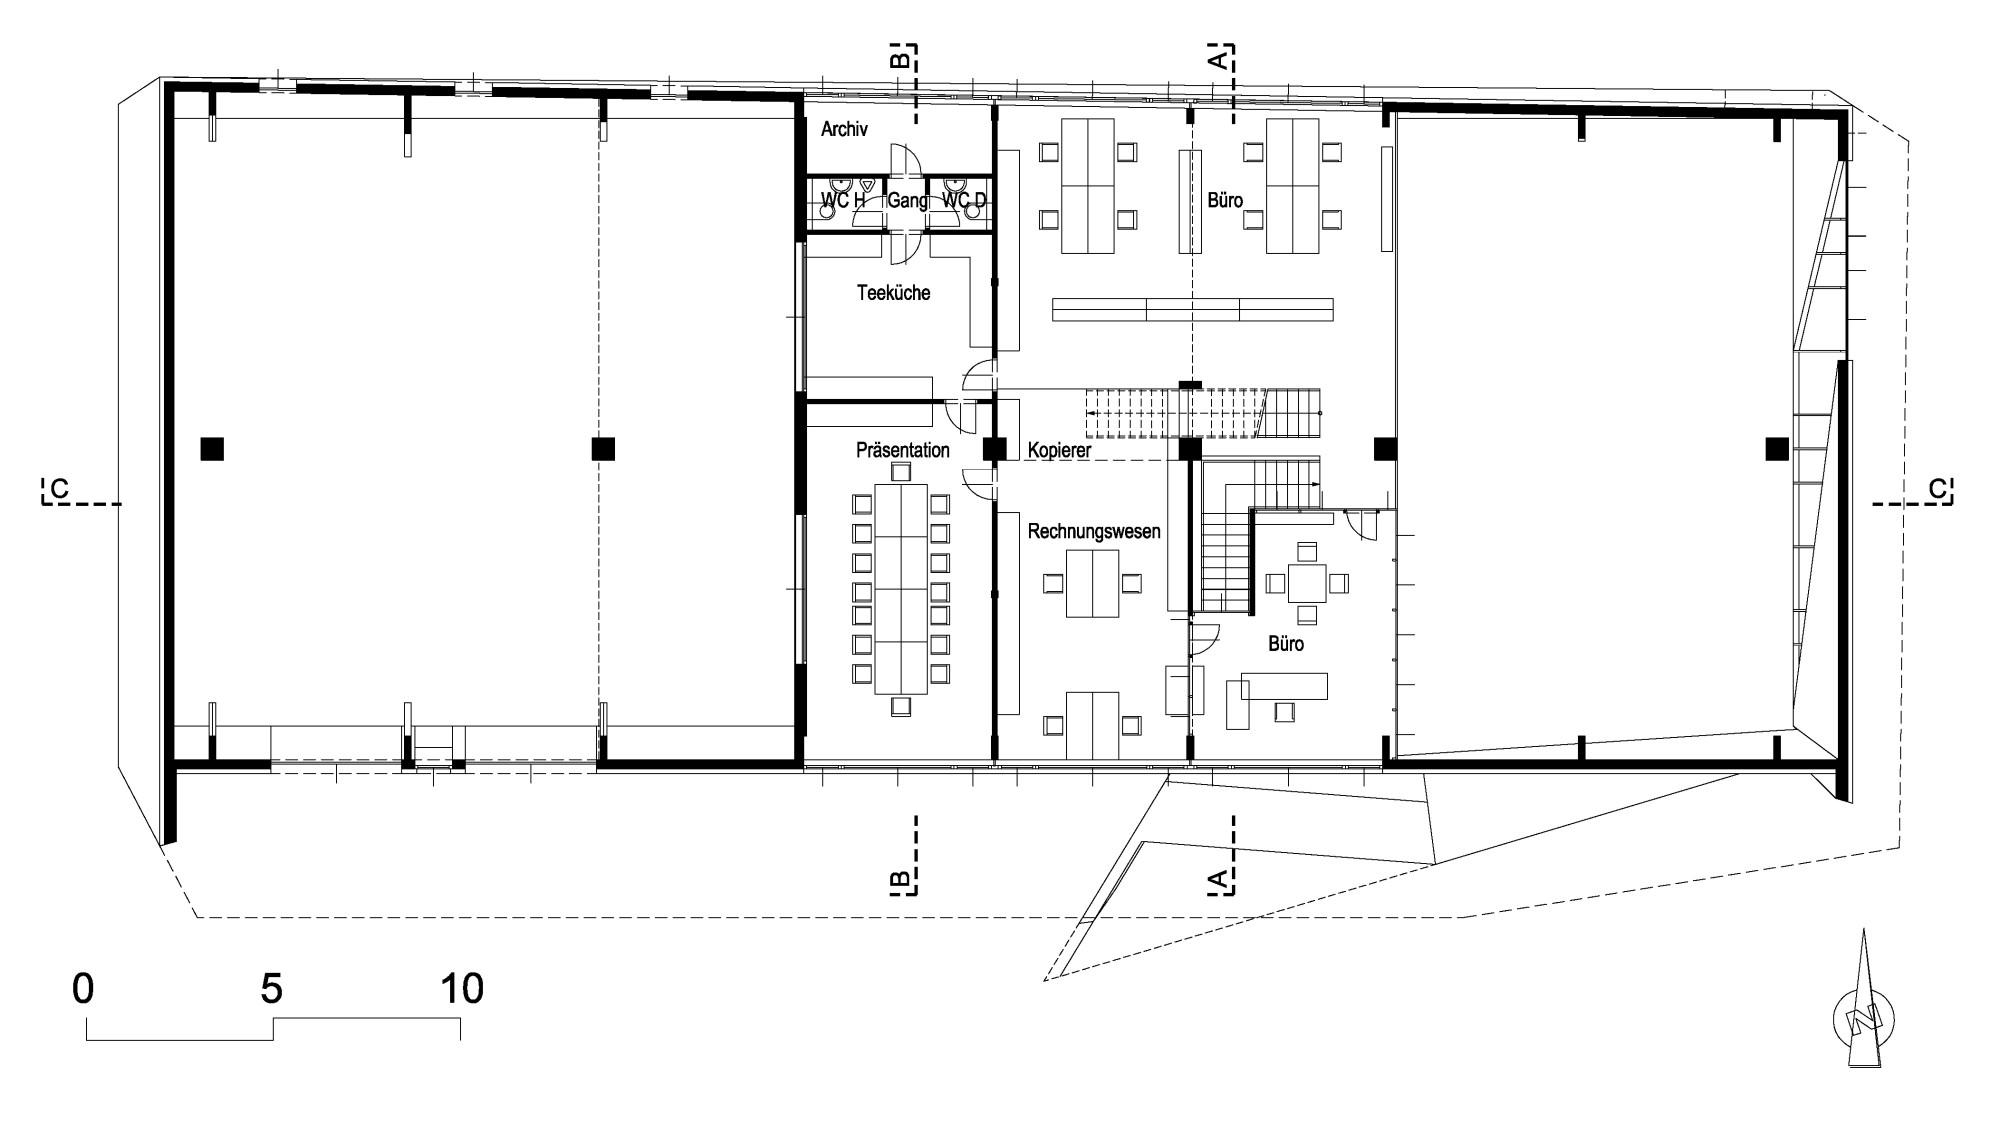 Firmenzentrale Dreier in Völkermarkt | Geneigtes Dach | Büro ... | {Teeküche büro grundriss 24}